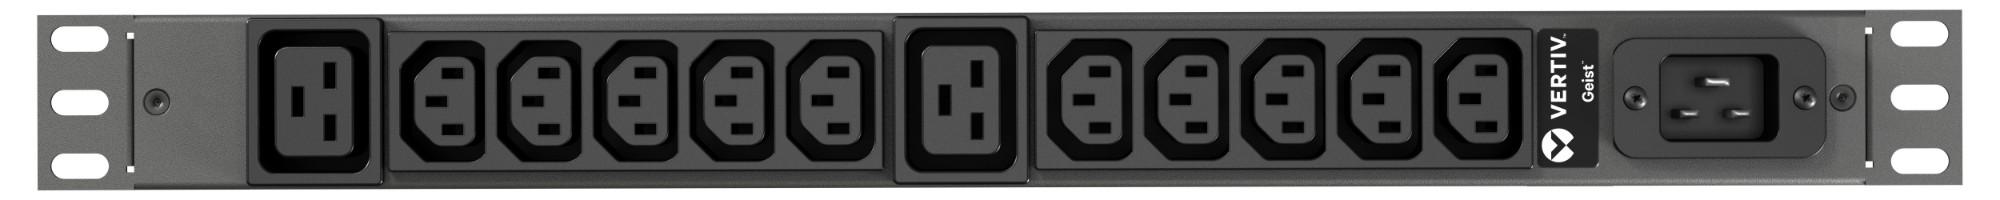 Vertiv Geist rPDU, basic, 1U, input C20 230V 16A, outputs (10)C13 | (2)C19 unidad de distribución de energía (PDU) Negro 12 salidas AC